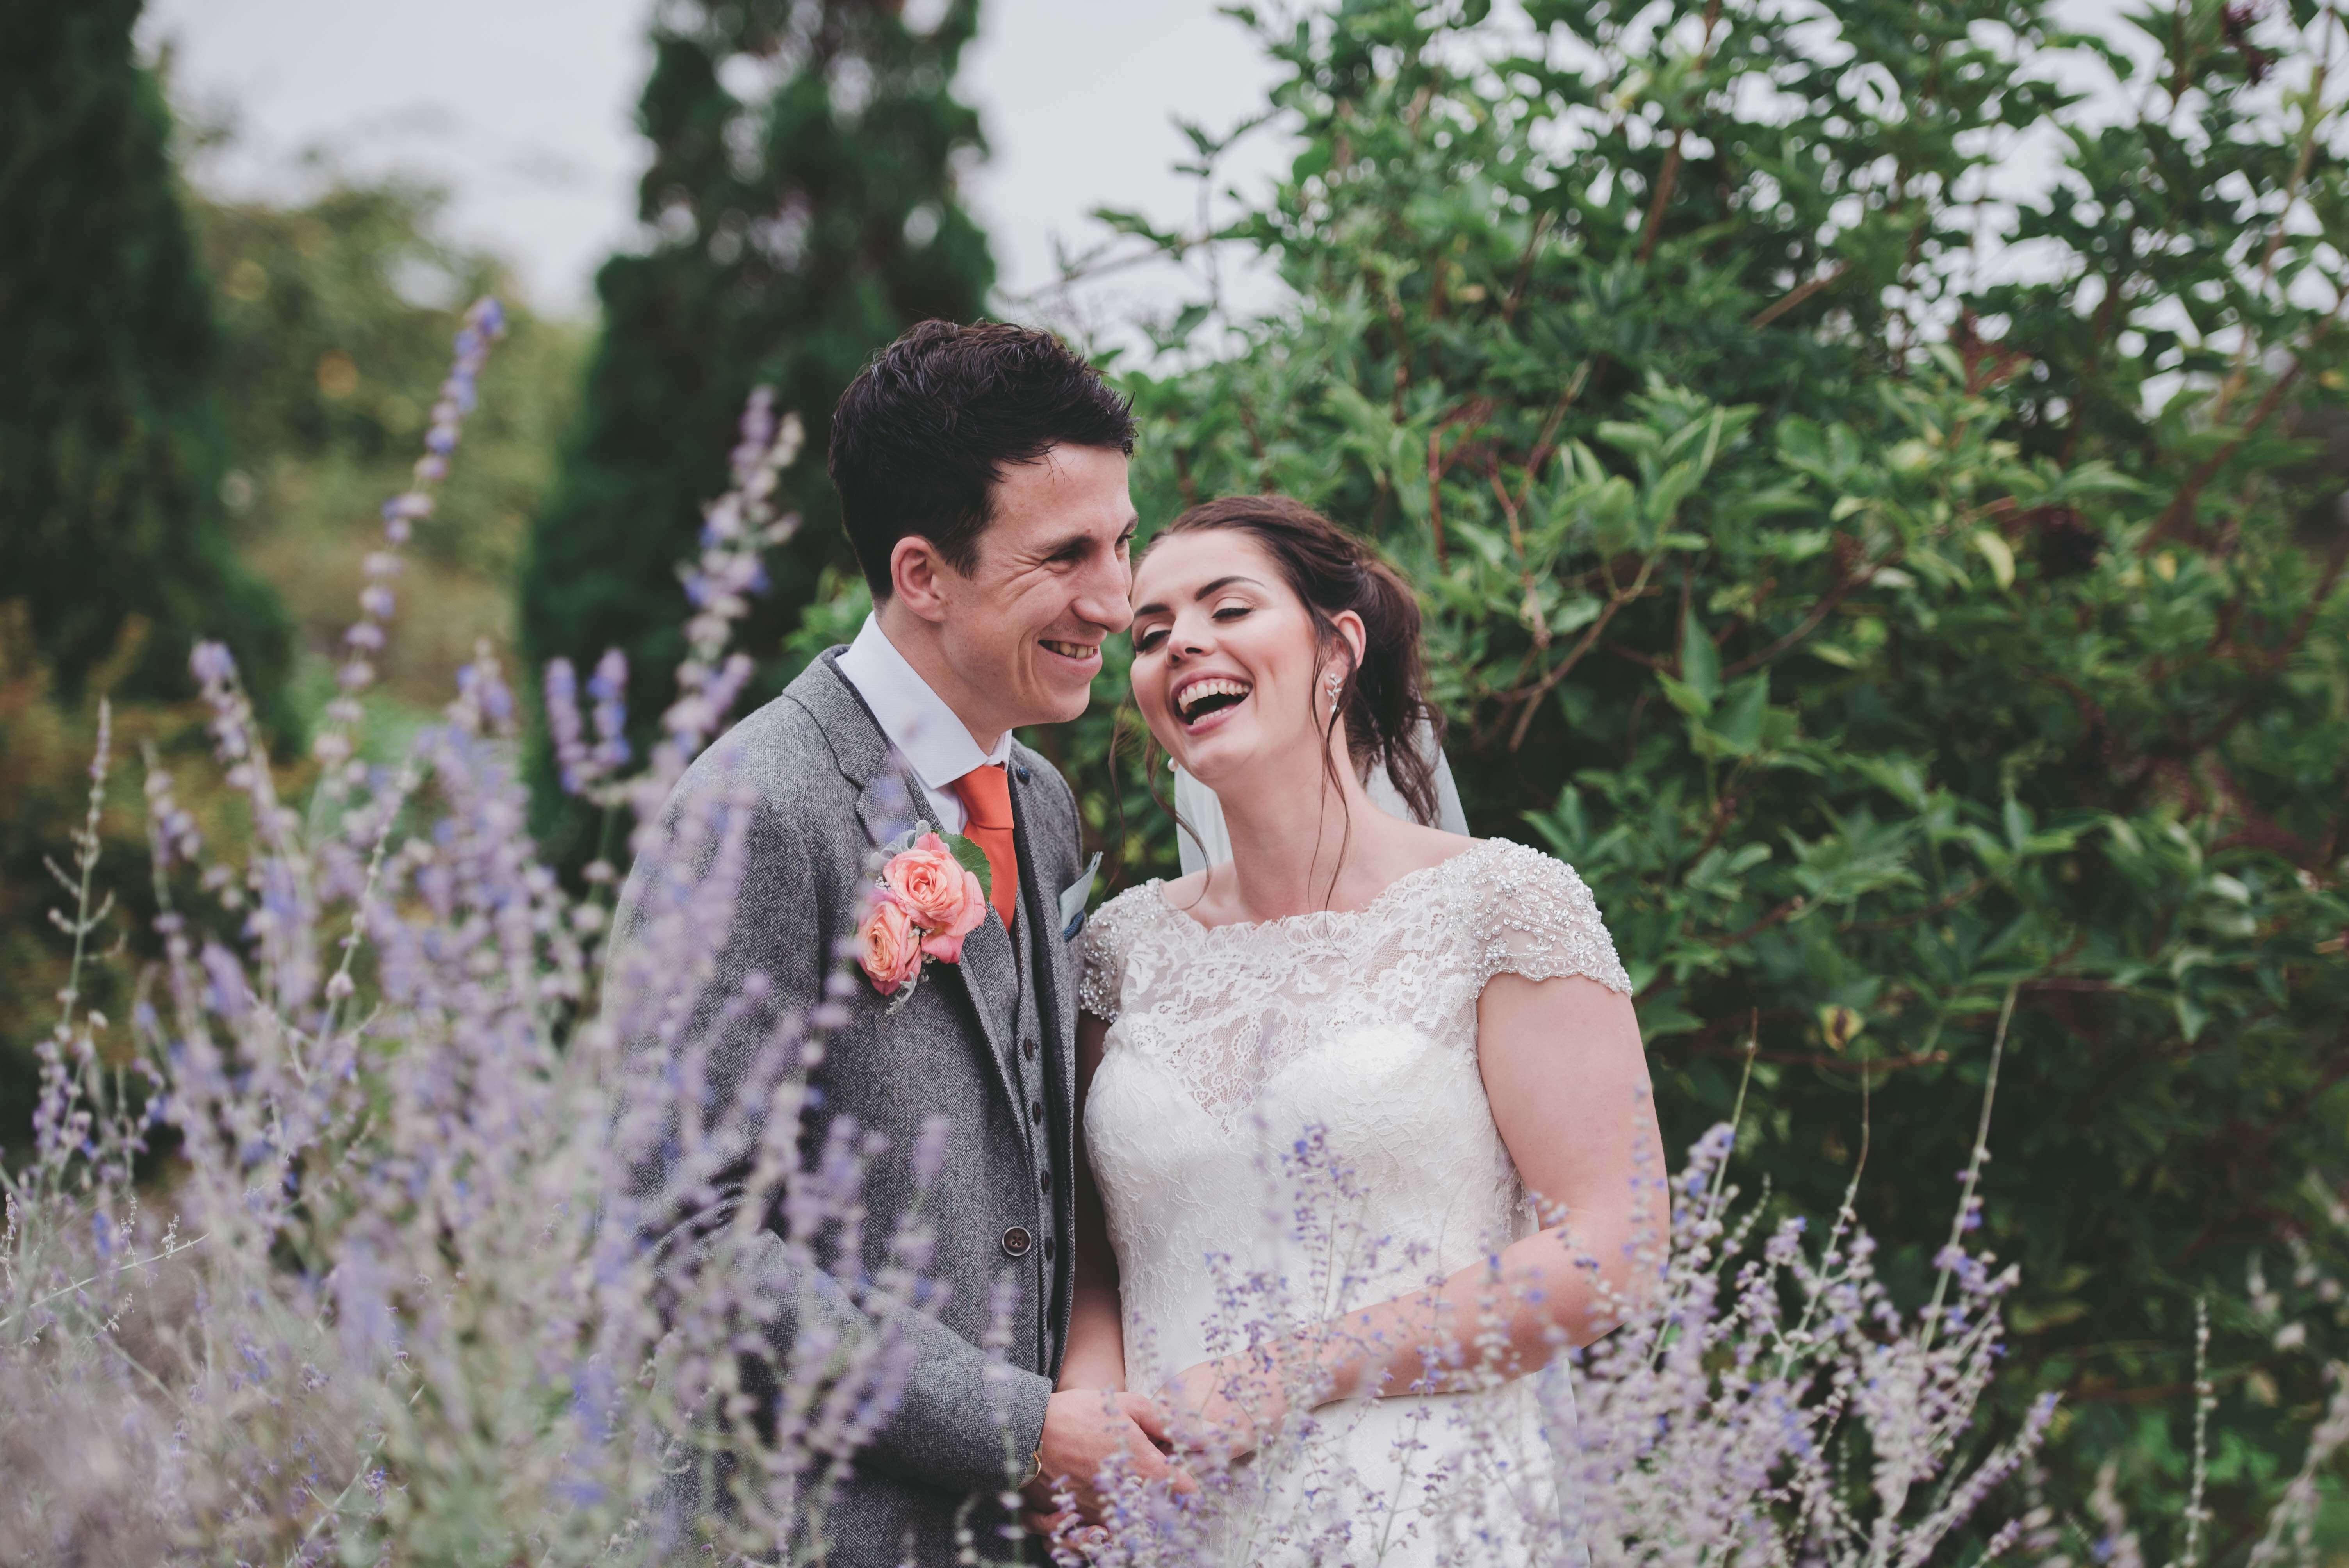 Wedding Photography Gallery 6